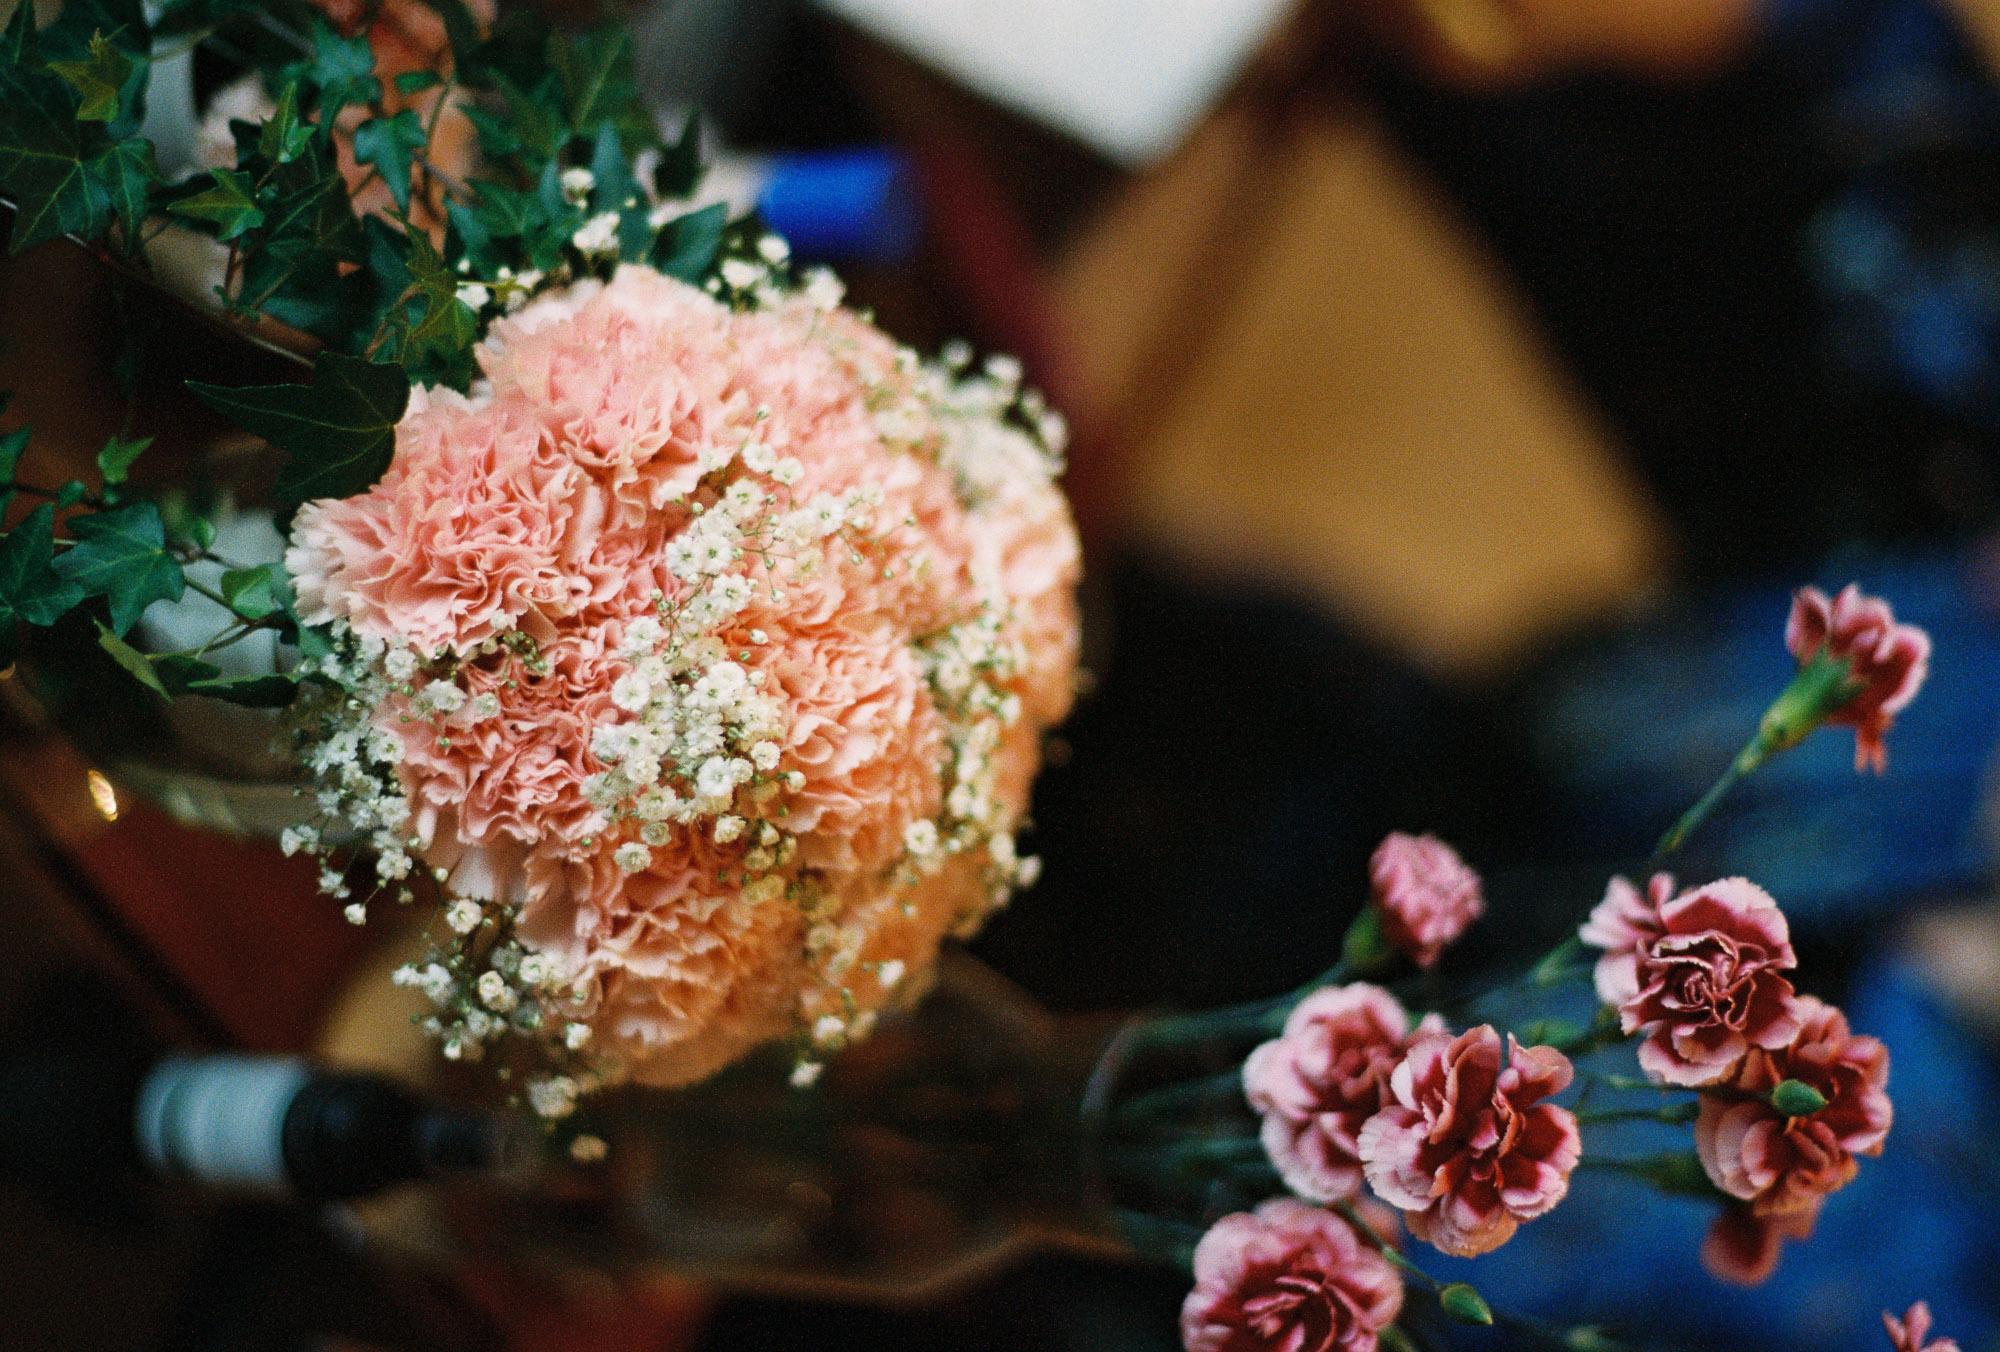 jere-satamo-analog-film-wedding-photographer-finland-008.jpg